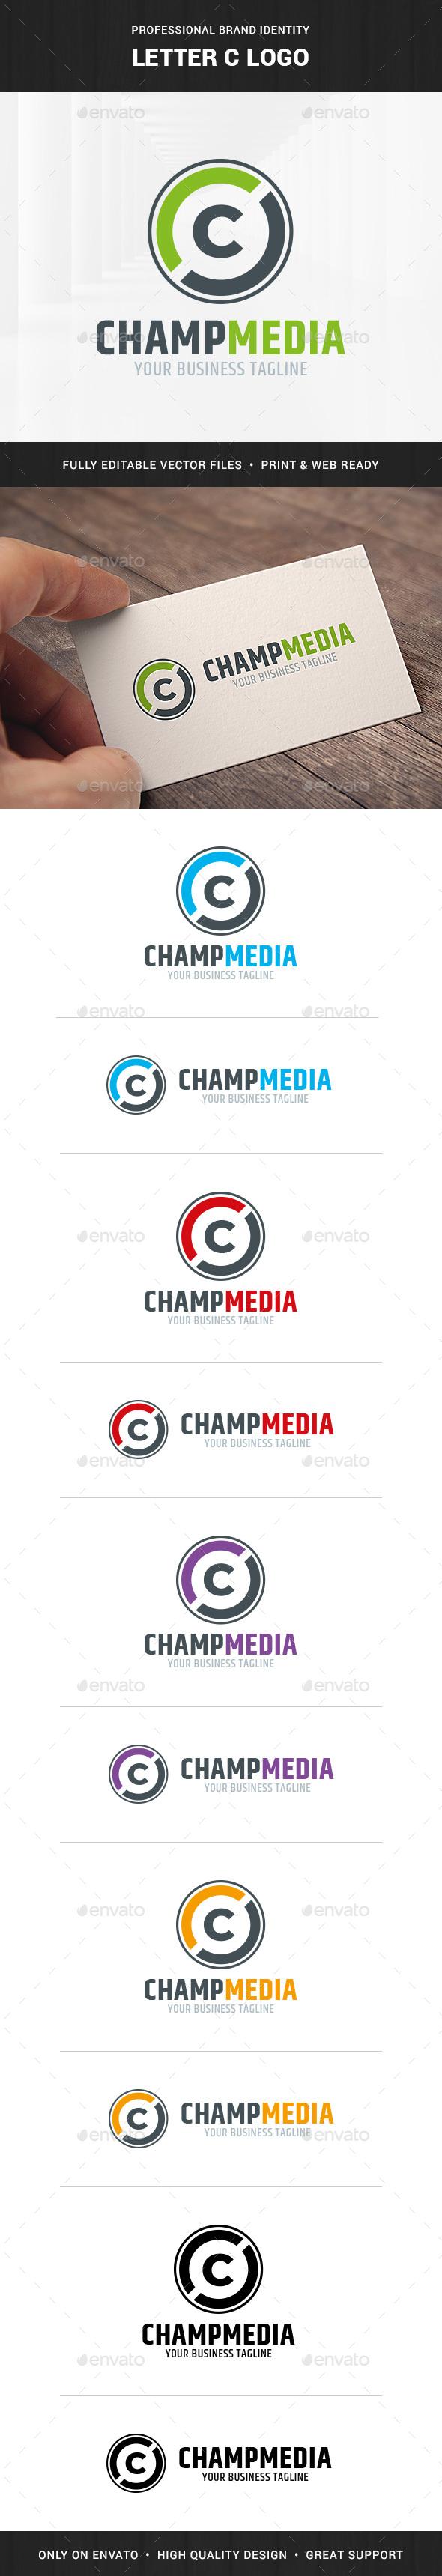 Letter C Logo Template - Letters Logo Templates